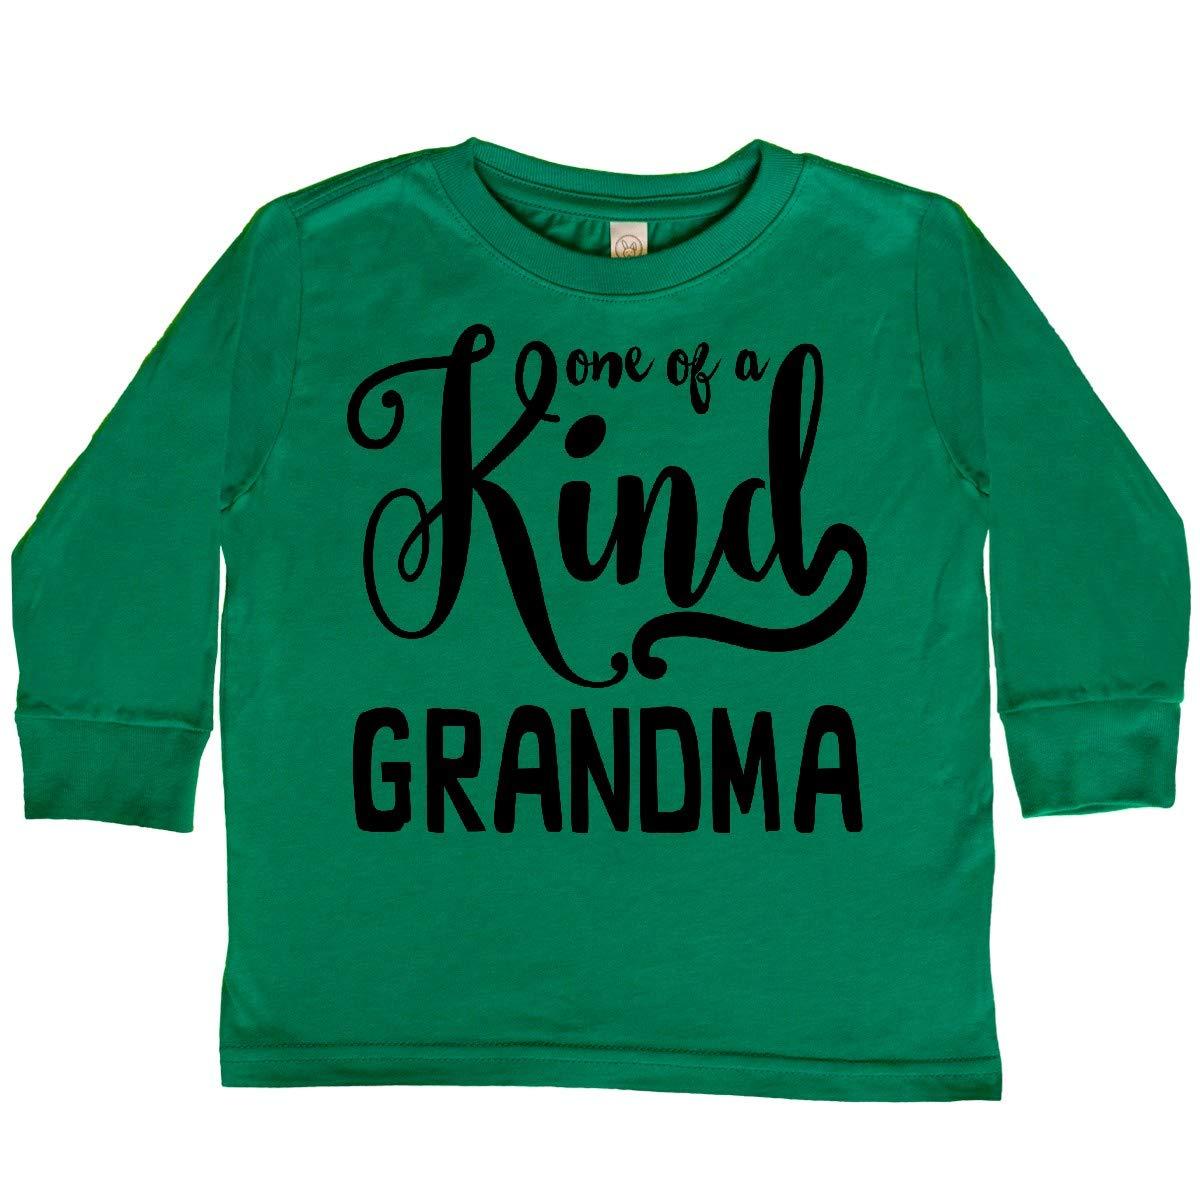 inktastic Gift for Grandmas 1 of a Kind Grandma Toddler Long Sleeve T-Shirt